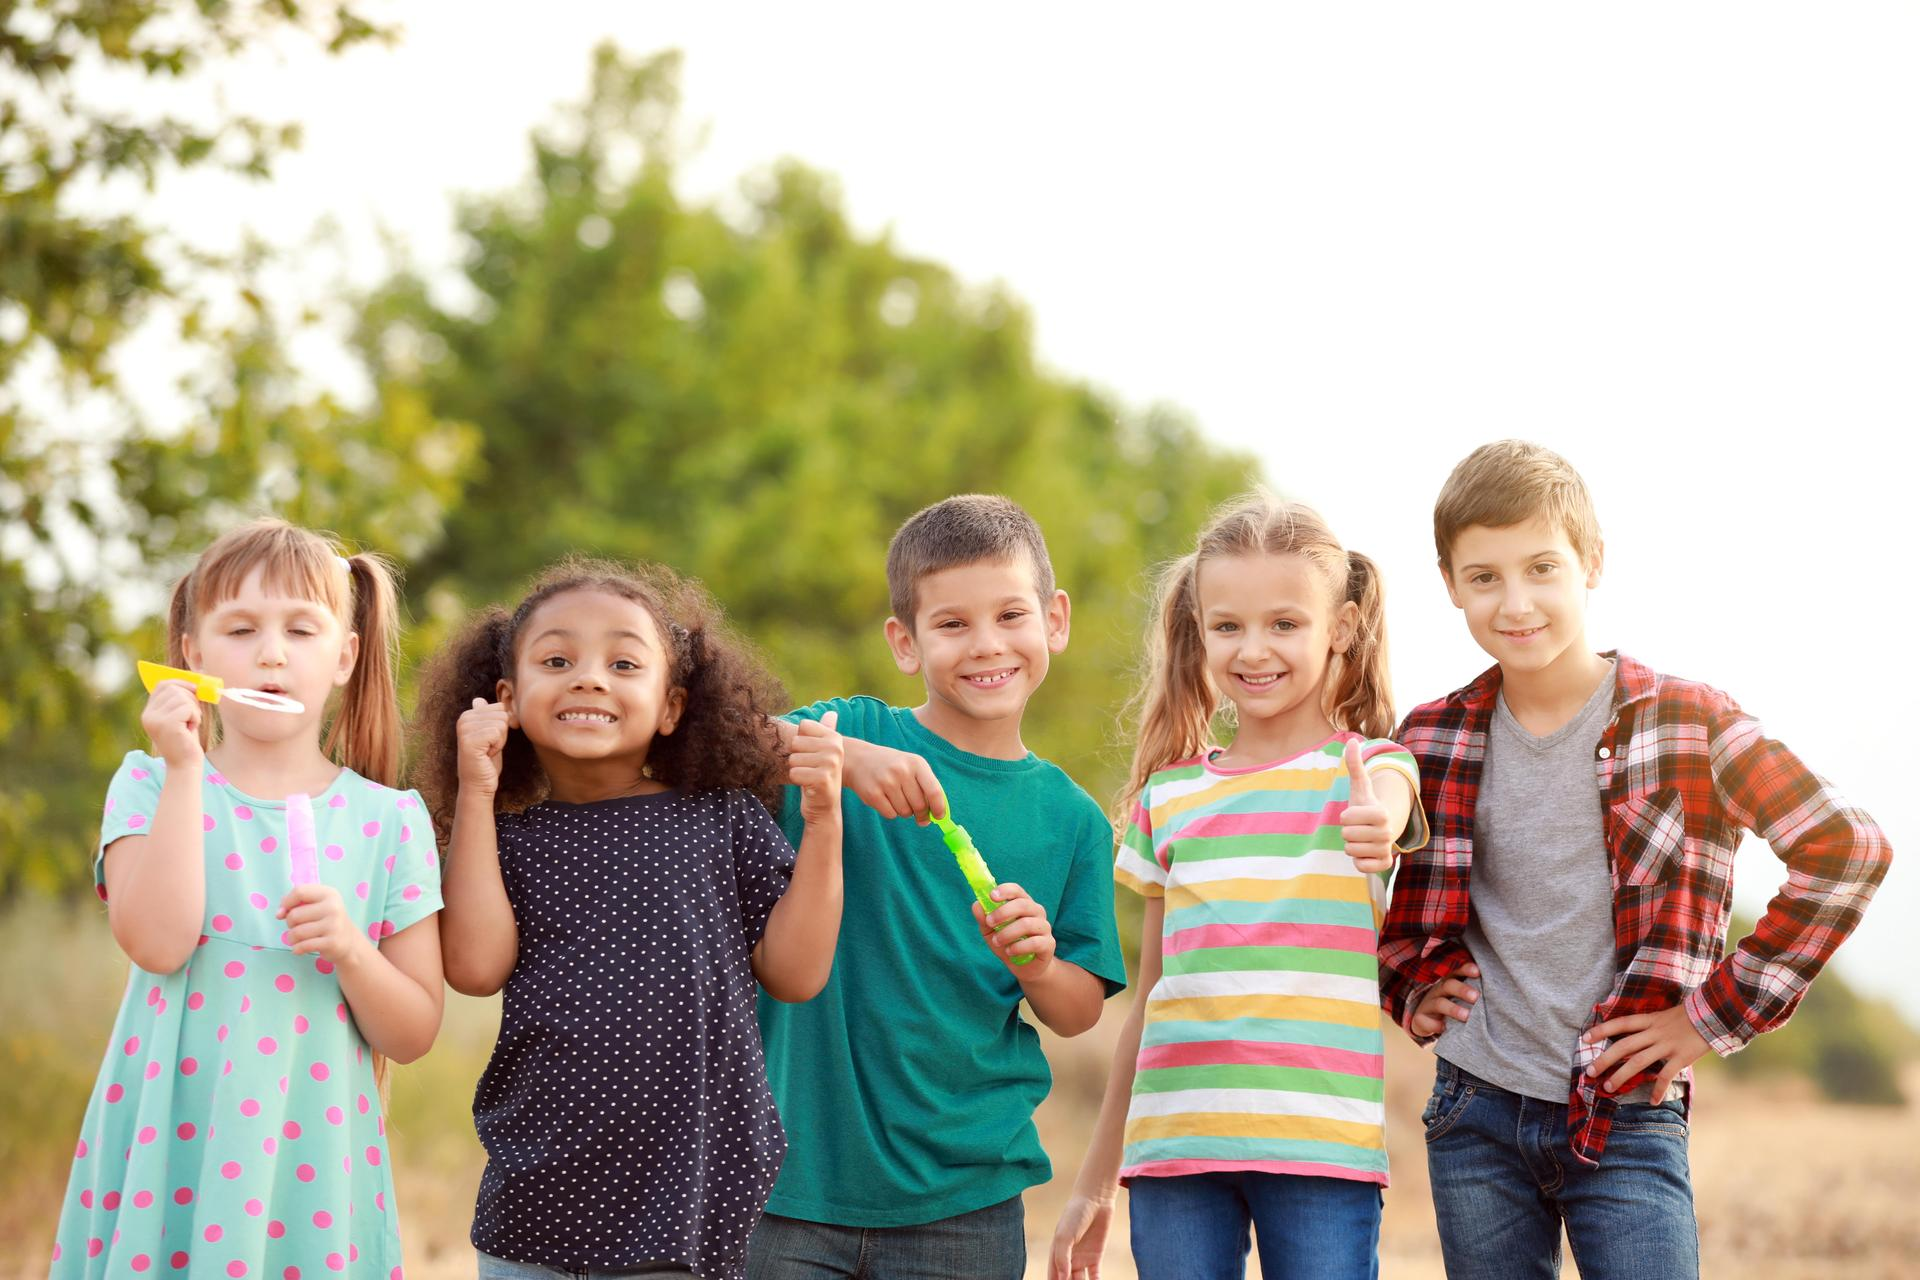 photo of school-age children